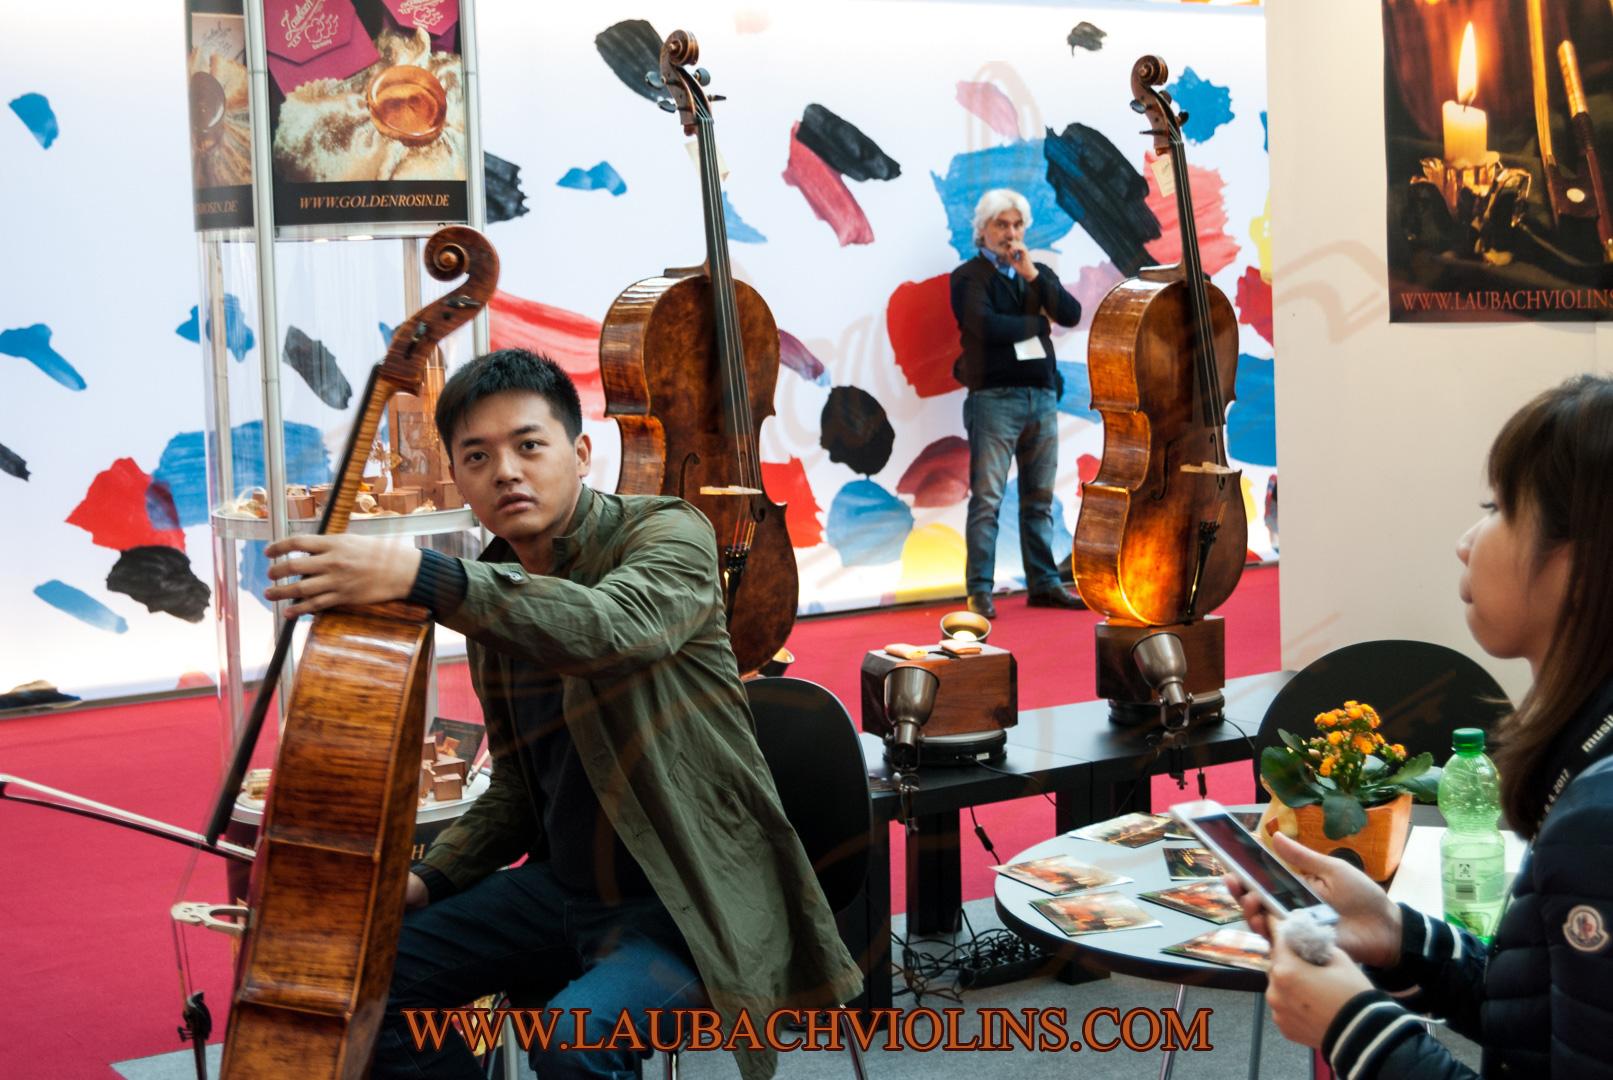 laubach_musikmesse_frankfurt_2017_17.jpg